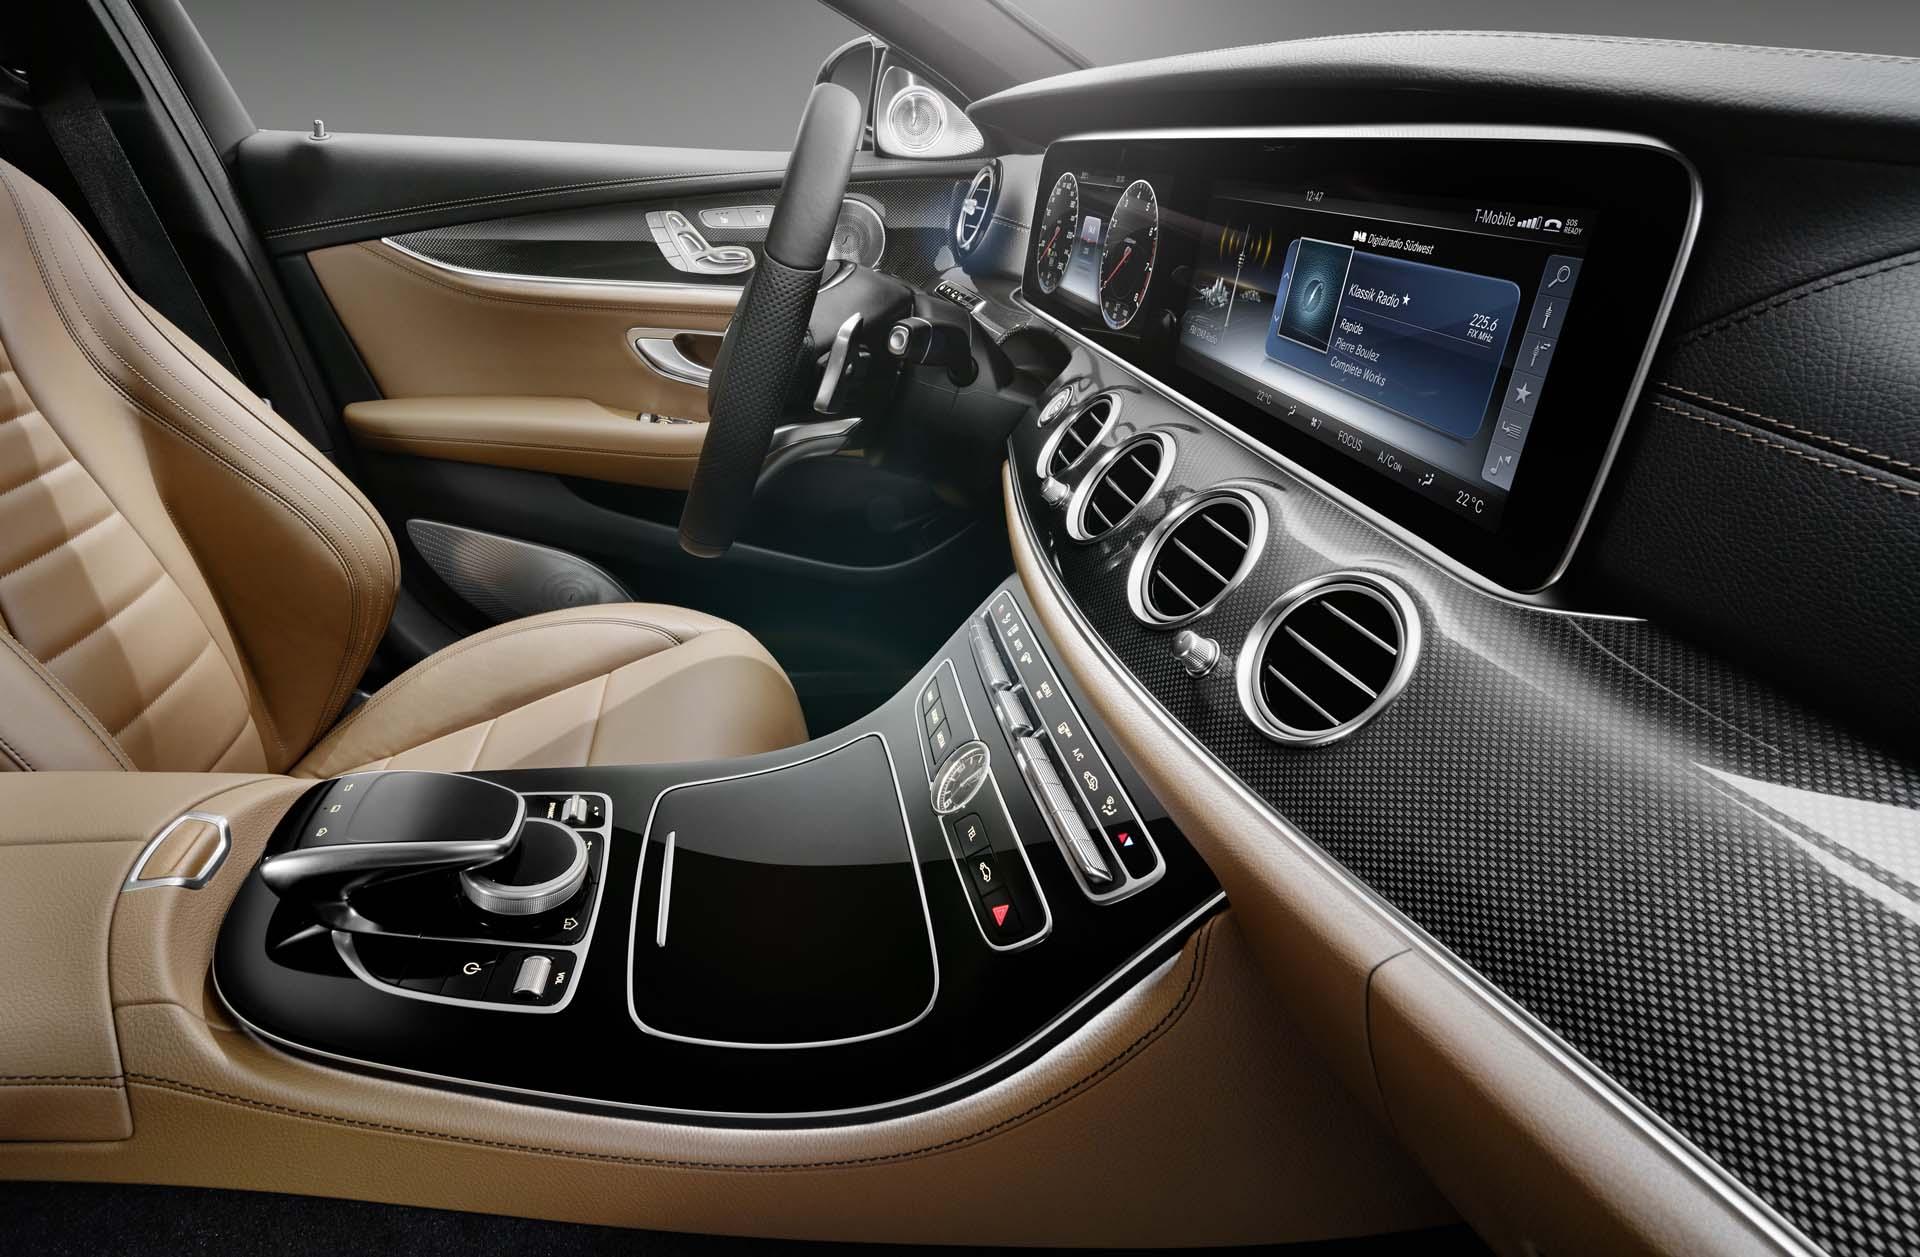 Interieur mercedes  2017 Mercedes-Benz E-Class Interior - Autos.ca